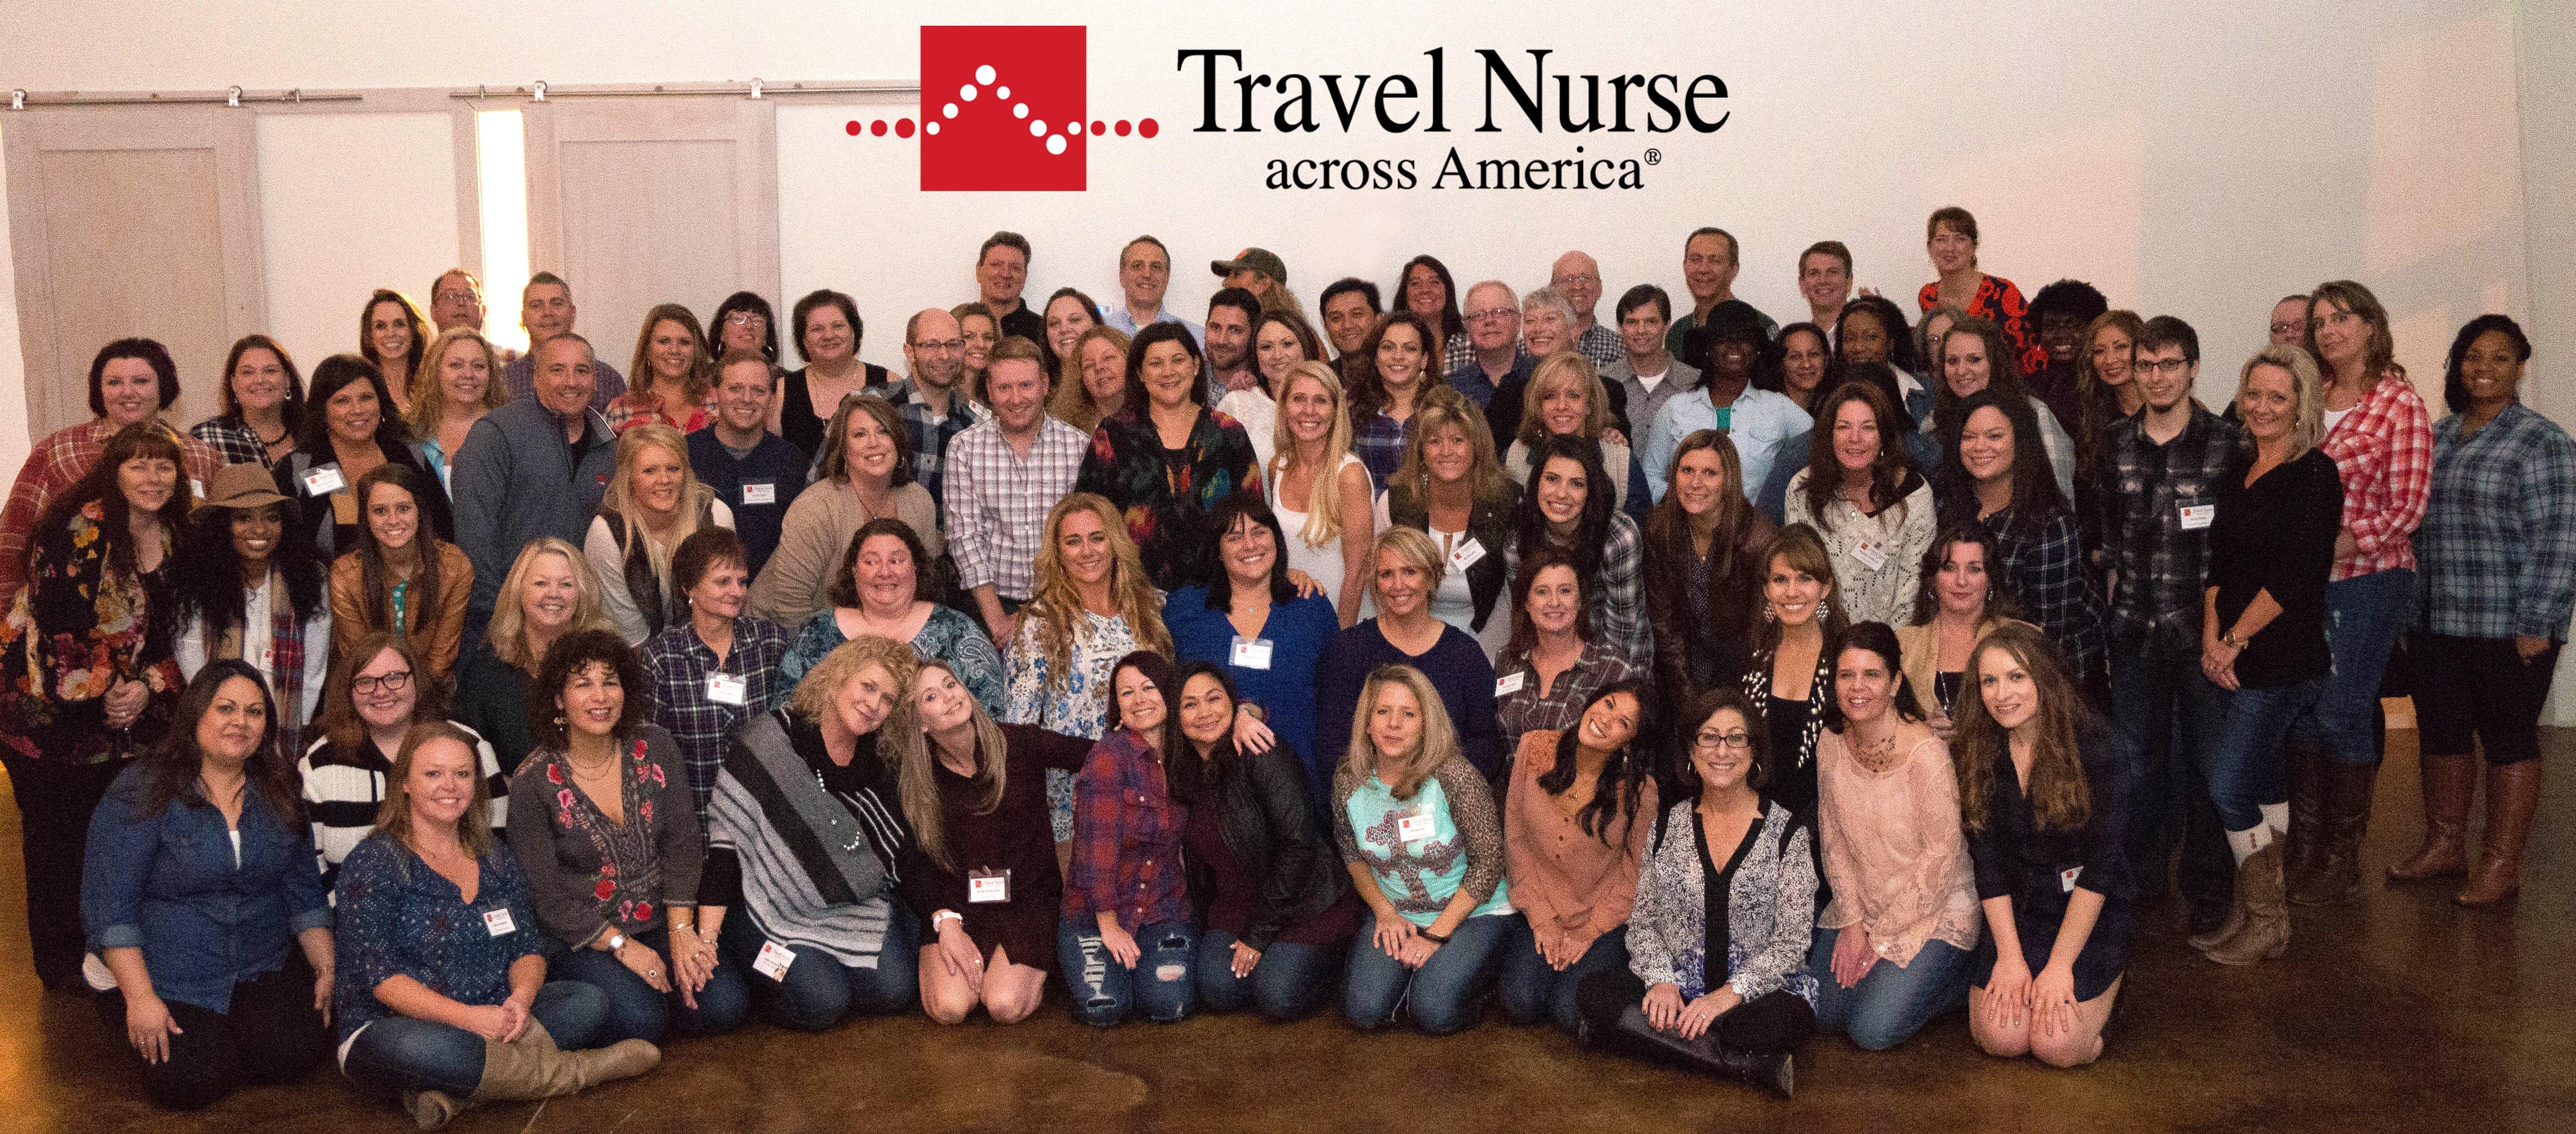 Asap Travel Agency Reviews